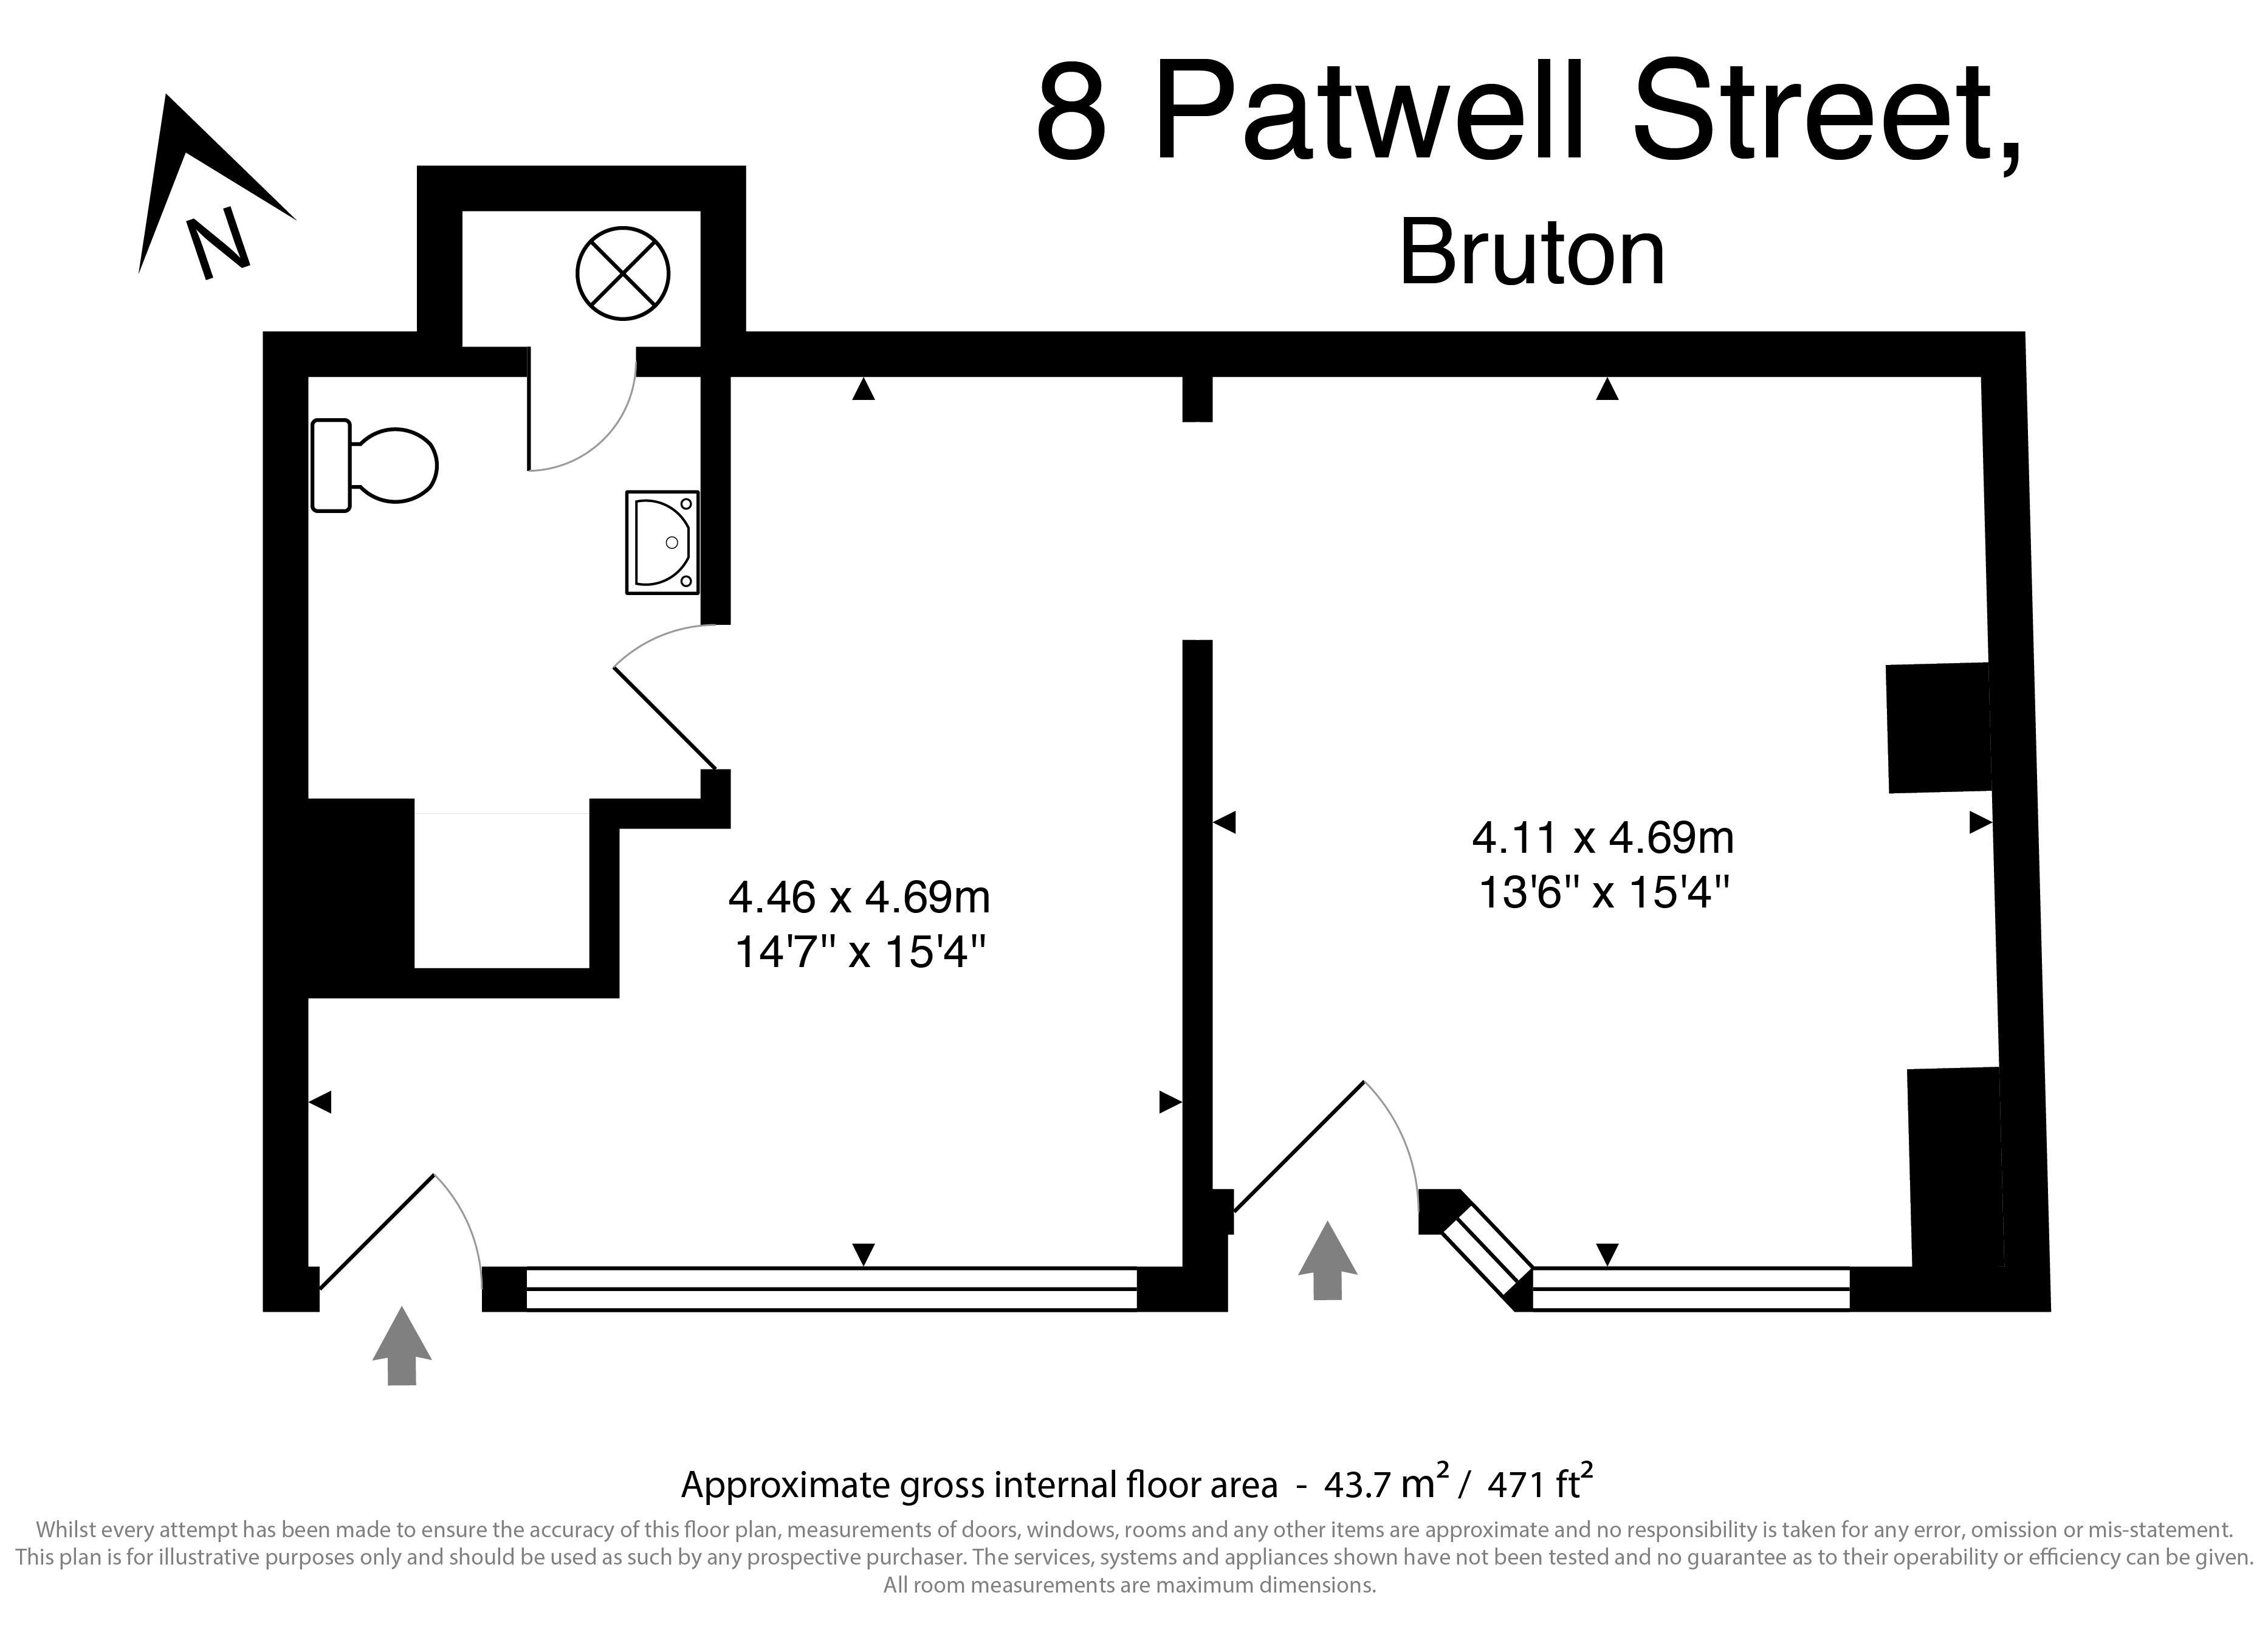 8 Patwell Street Floorplan